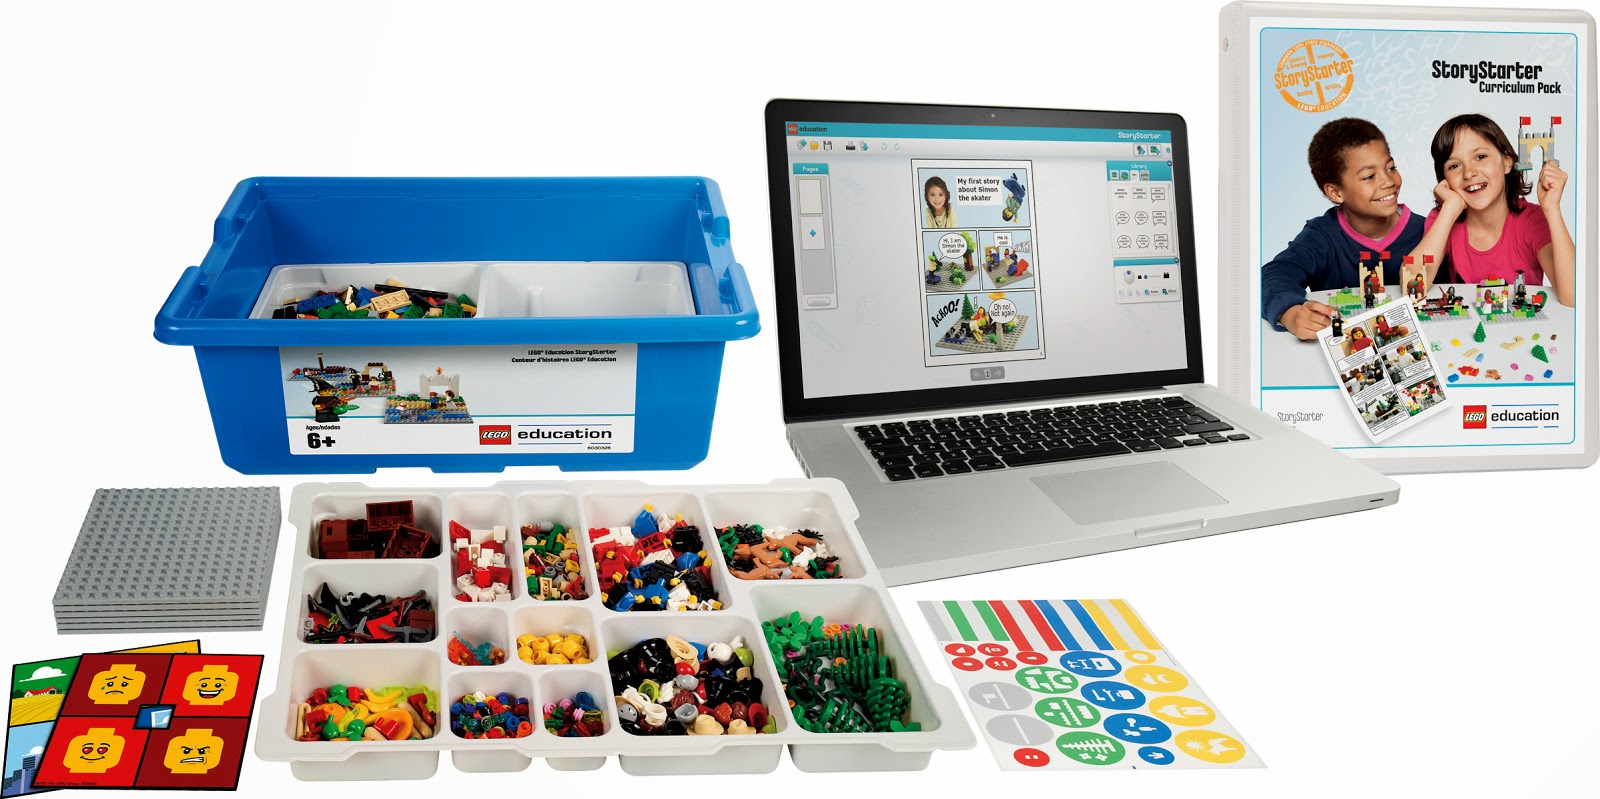 lego education educational robot